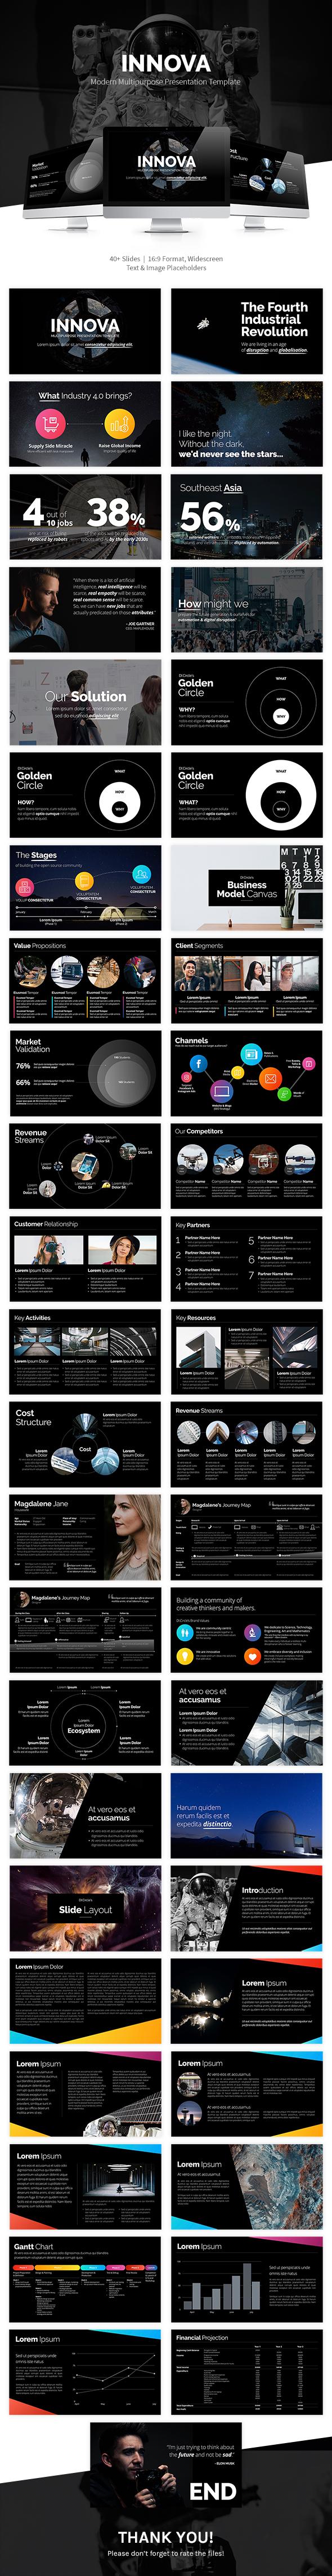 Innova Powerpoint Presentation Pitch Deck - PowerPoint Templates Presentation Templates